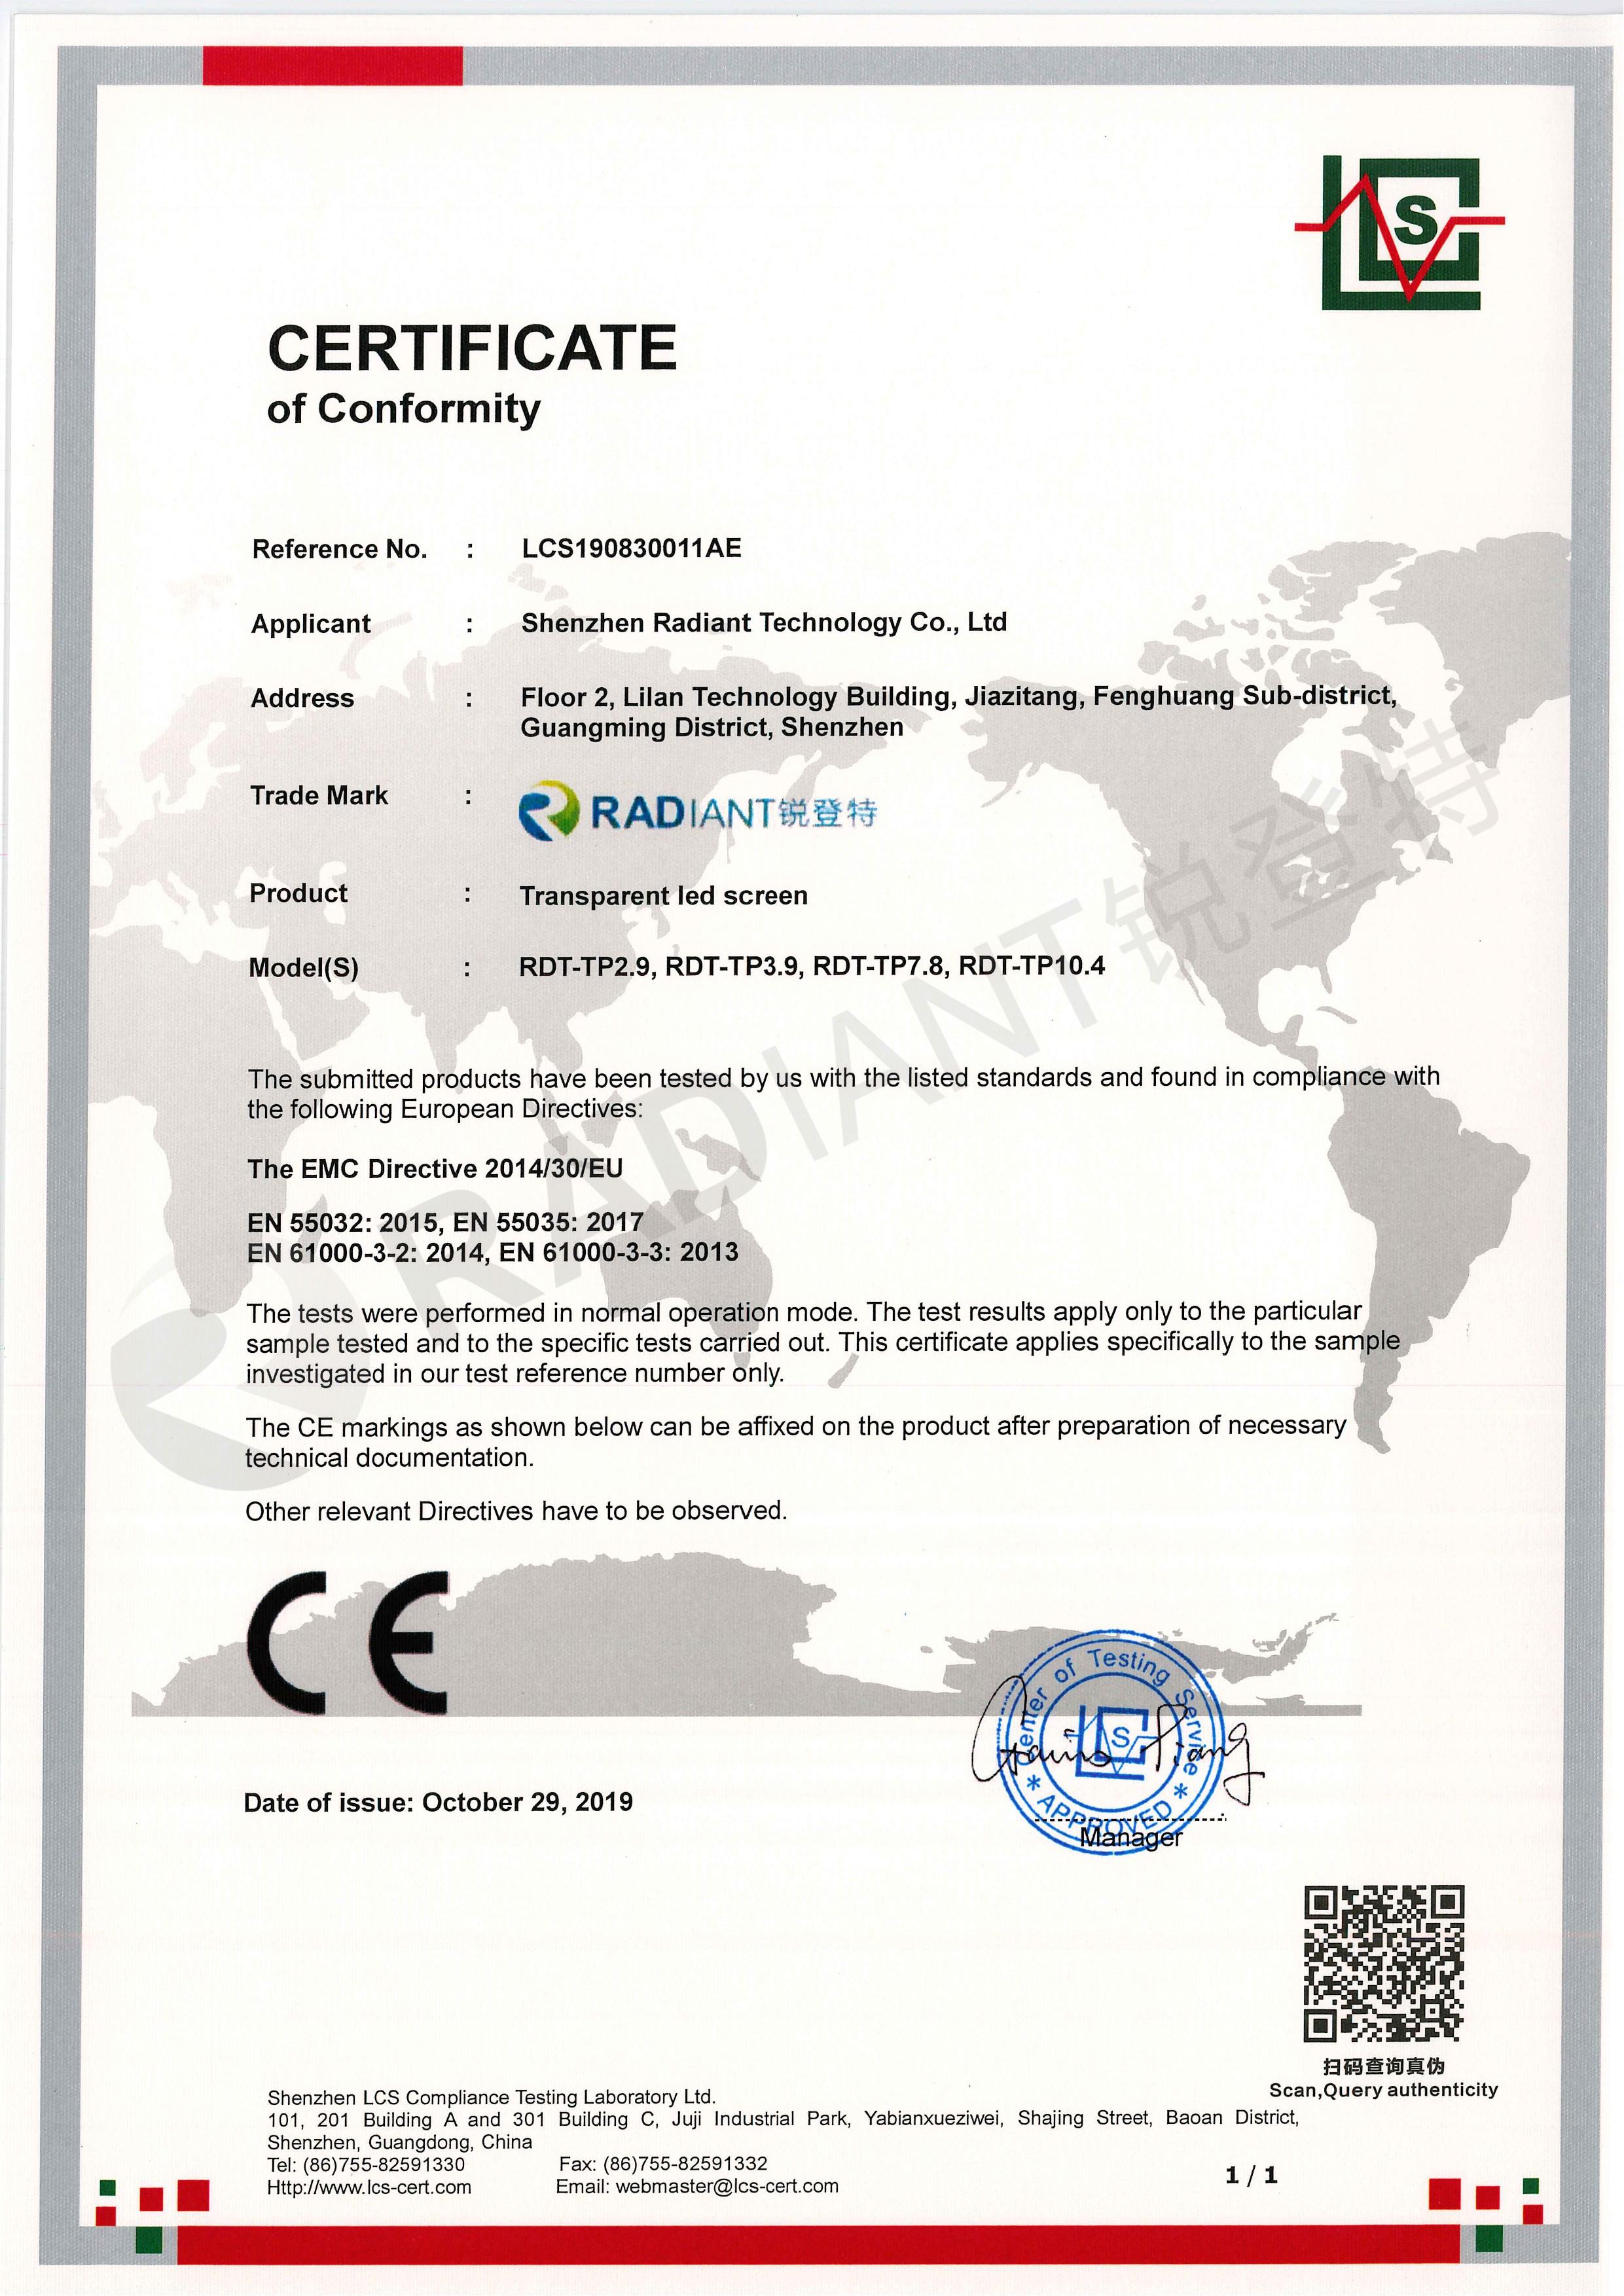 Transparent led Screen-CE-EMC_1